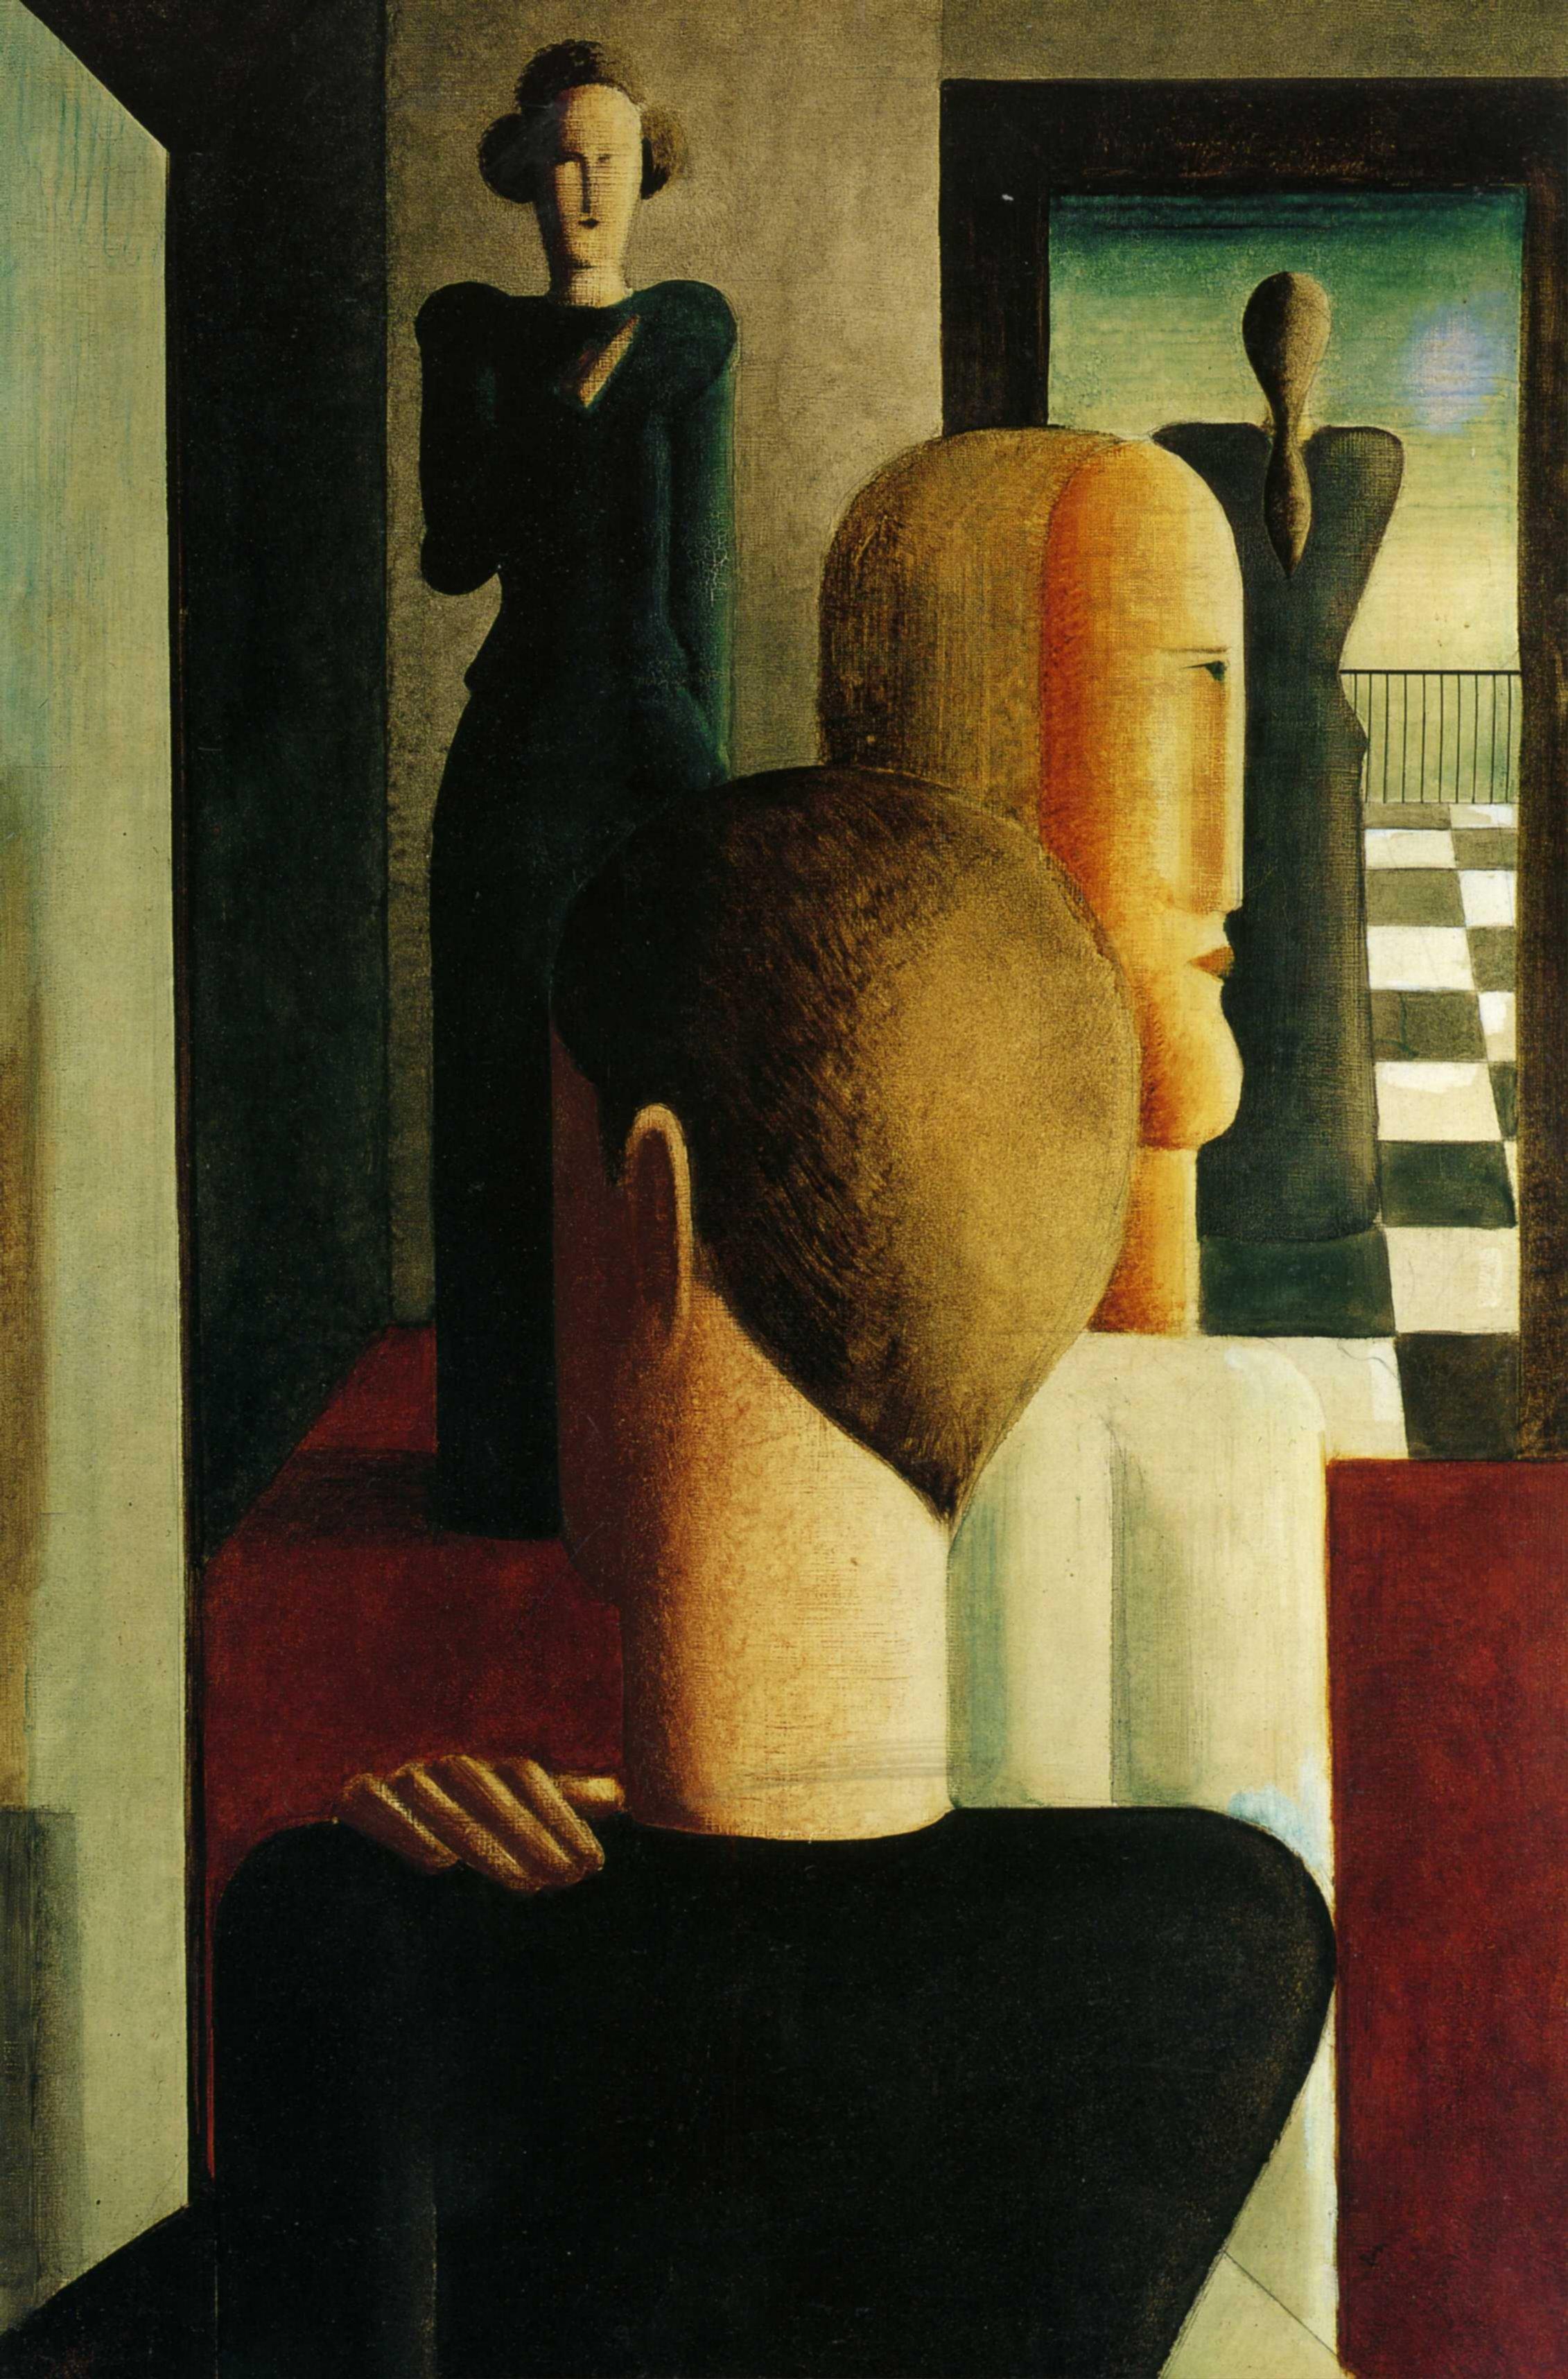 Оскар Шлеммер. Четыре фигуры в комнате 1925